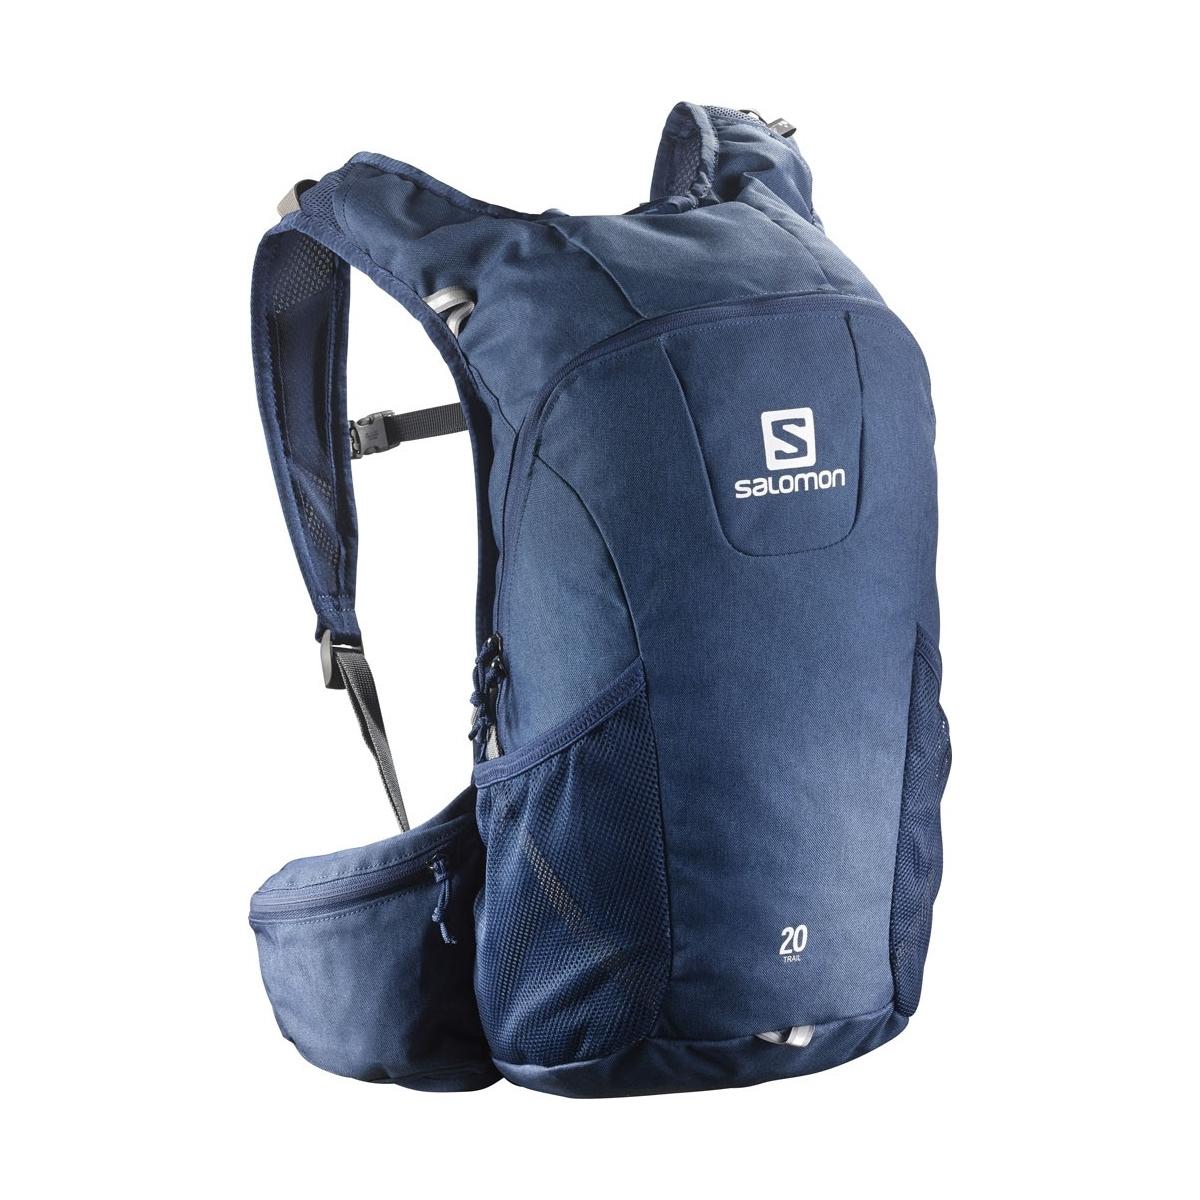 meilleures baskets f5dbd cfefc Sac A Dos Salomon Trail 20 Midnight Blue Chine Bl